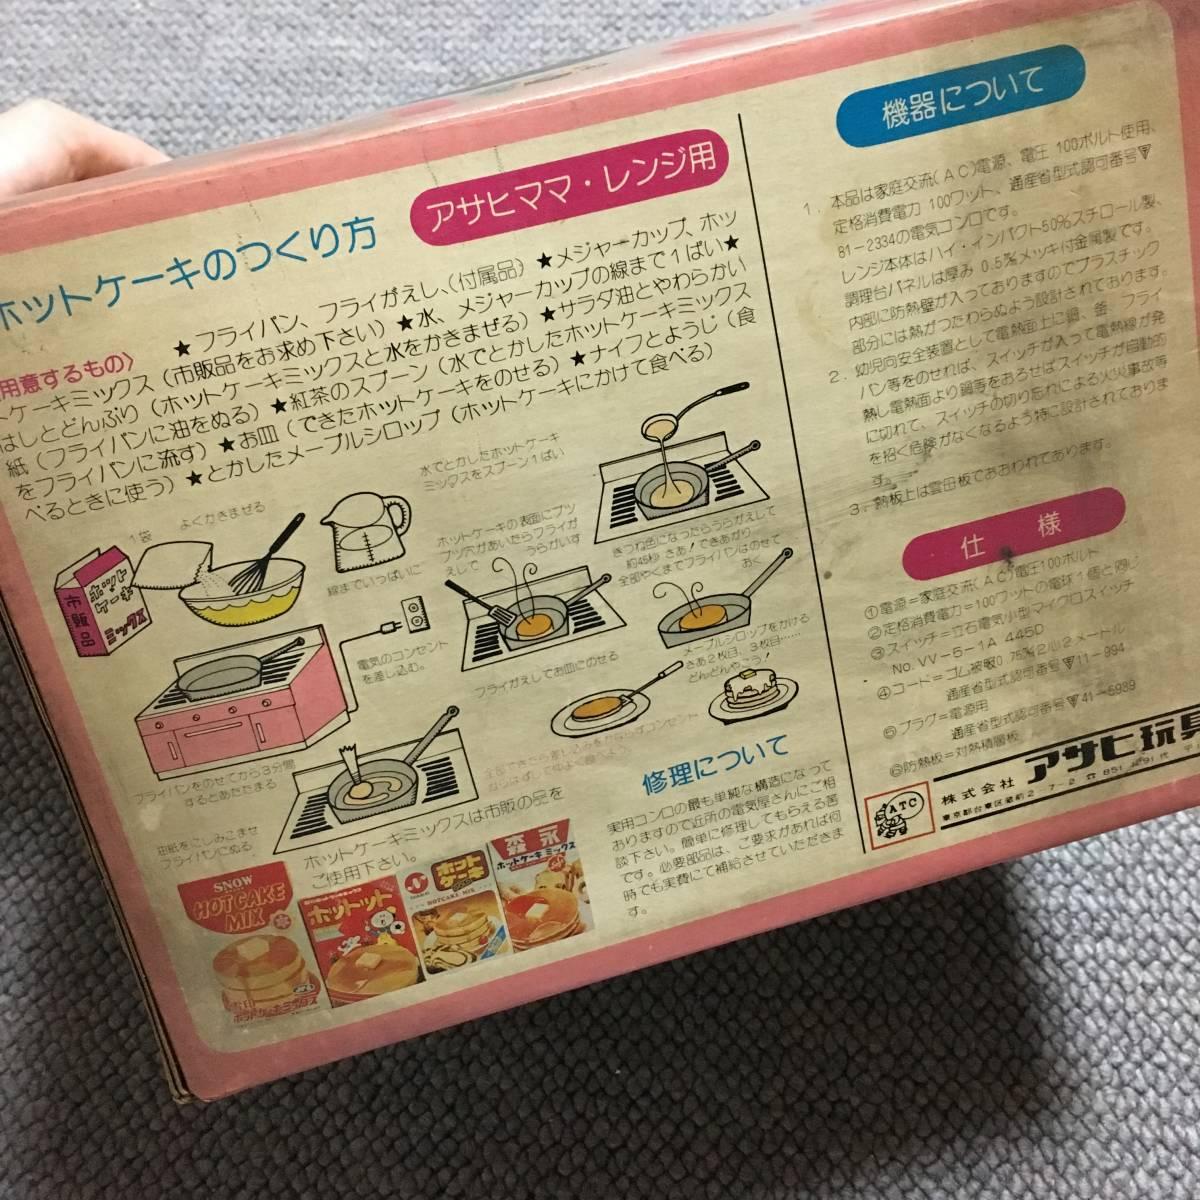 A30 445☆アサヒ ママレンジ 通電OK 動作未確認 昭和レトロ_画像8